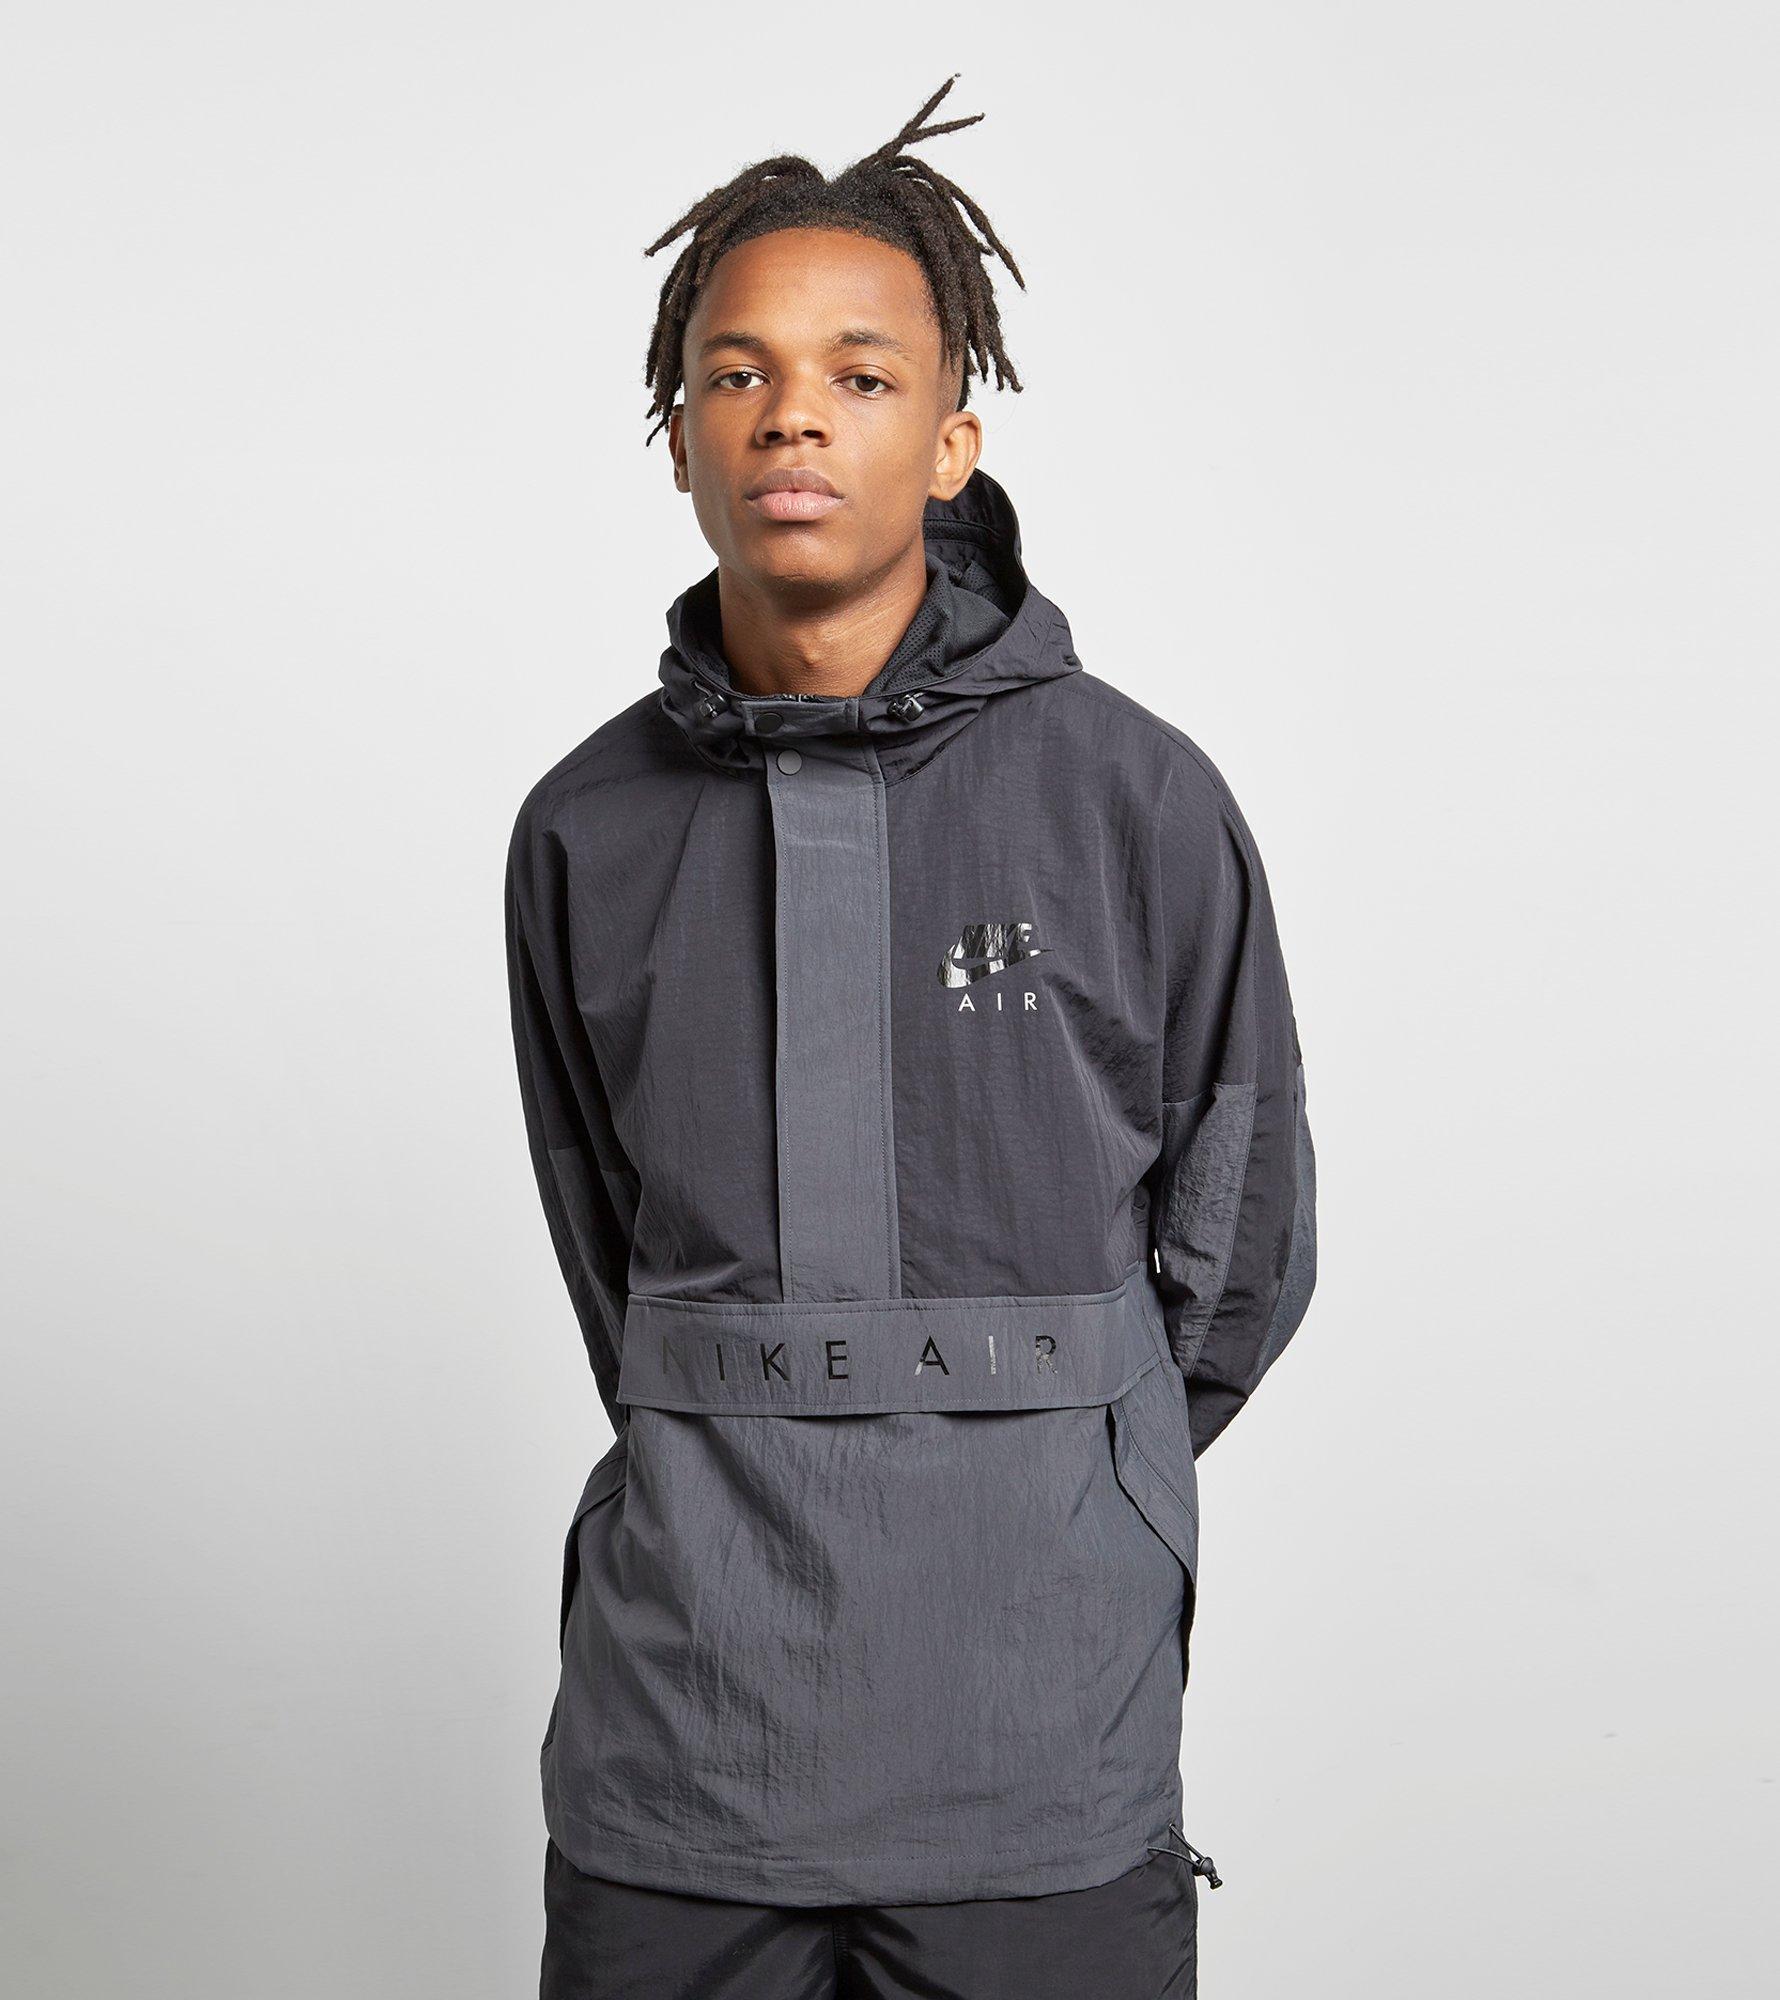 Nike Air Half-zip Jacket in Black for Men - Lyst fa3c5d37c